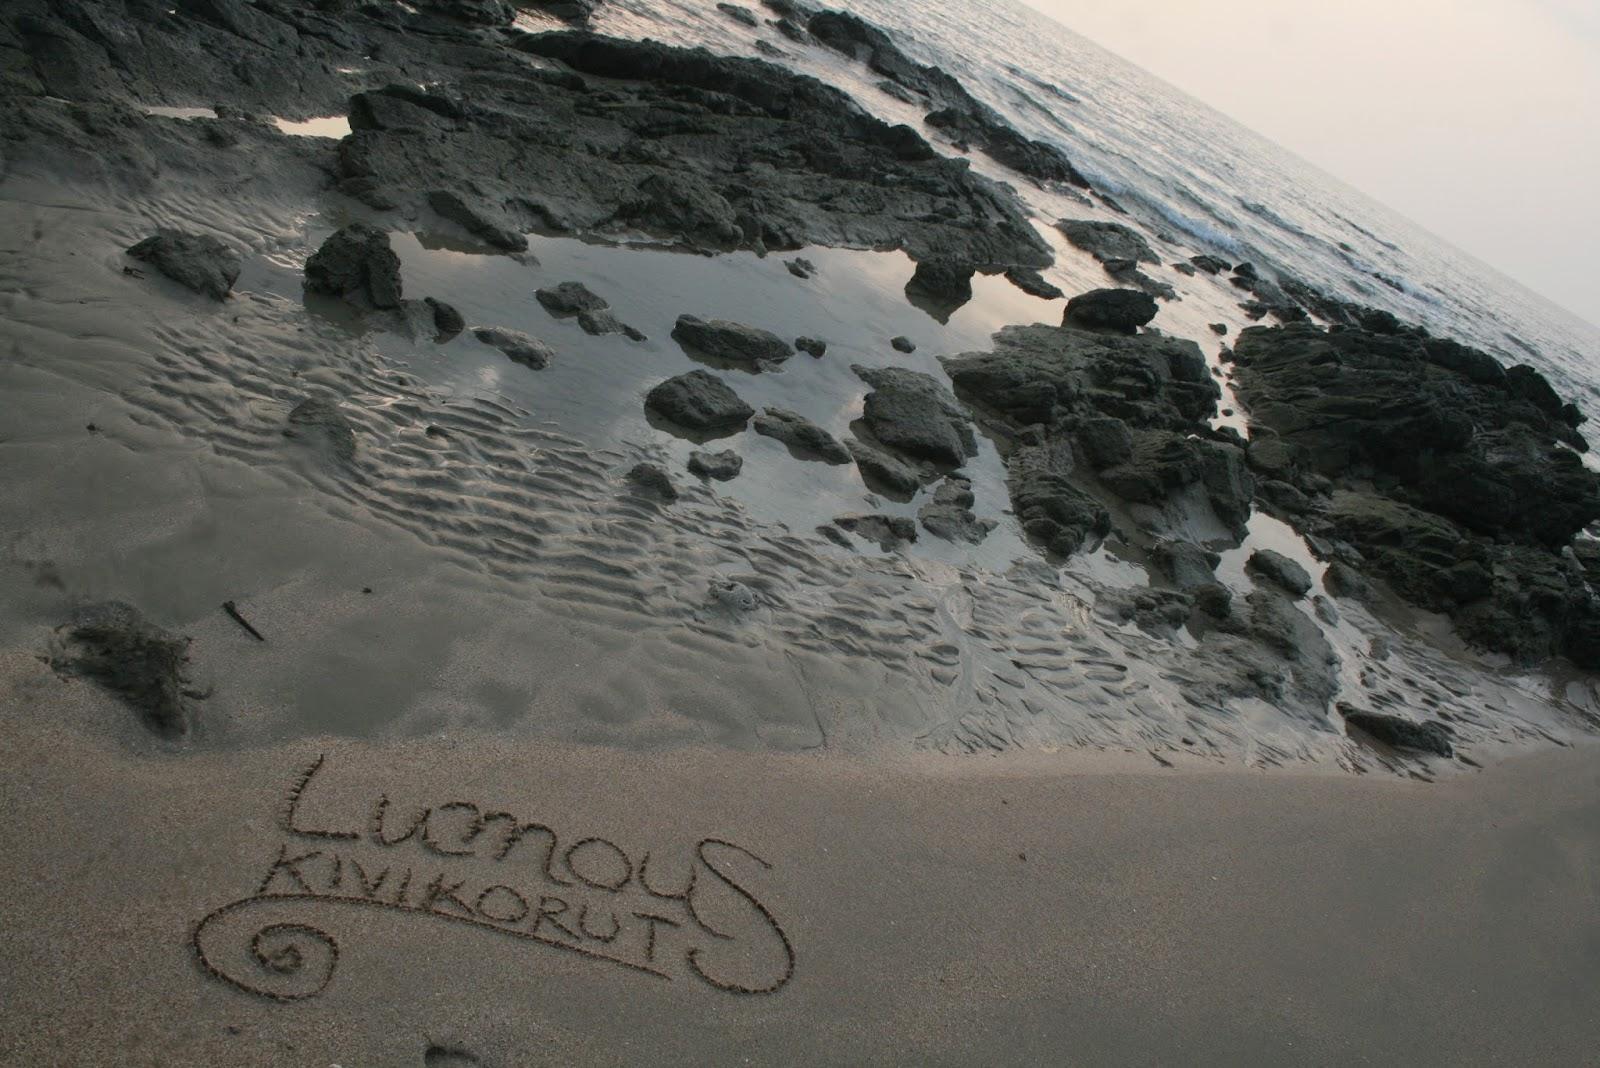 https://www.facebook.com/LumousKoru?ref=hl